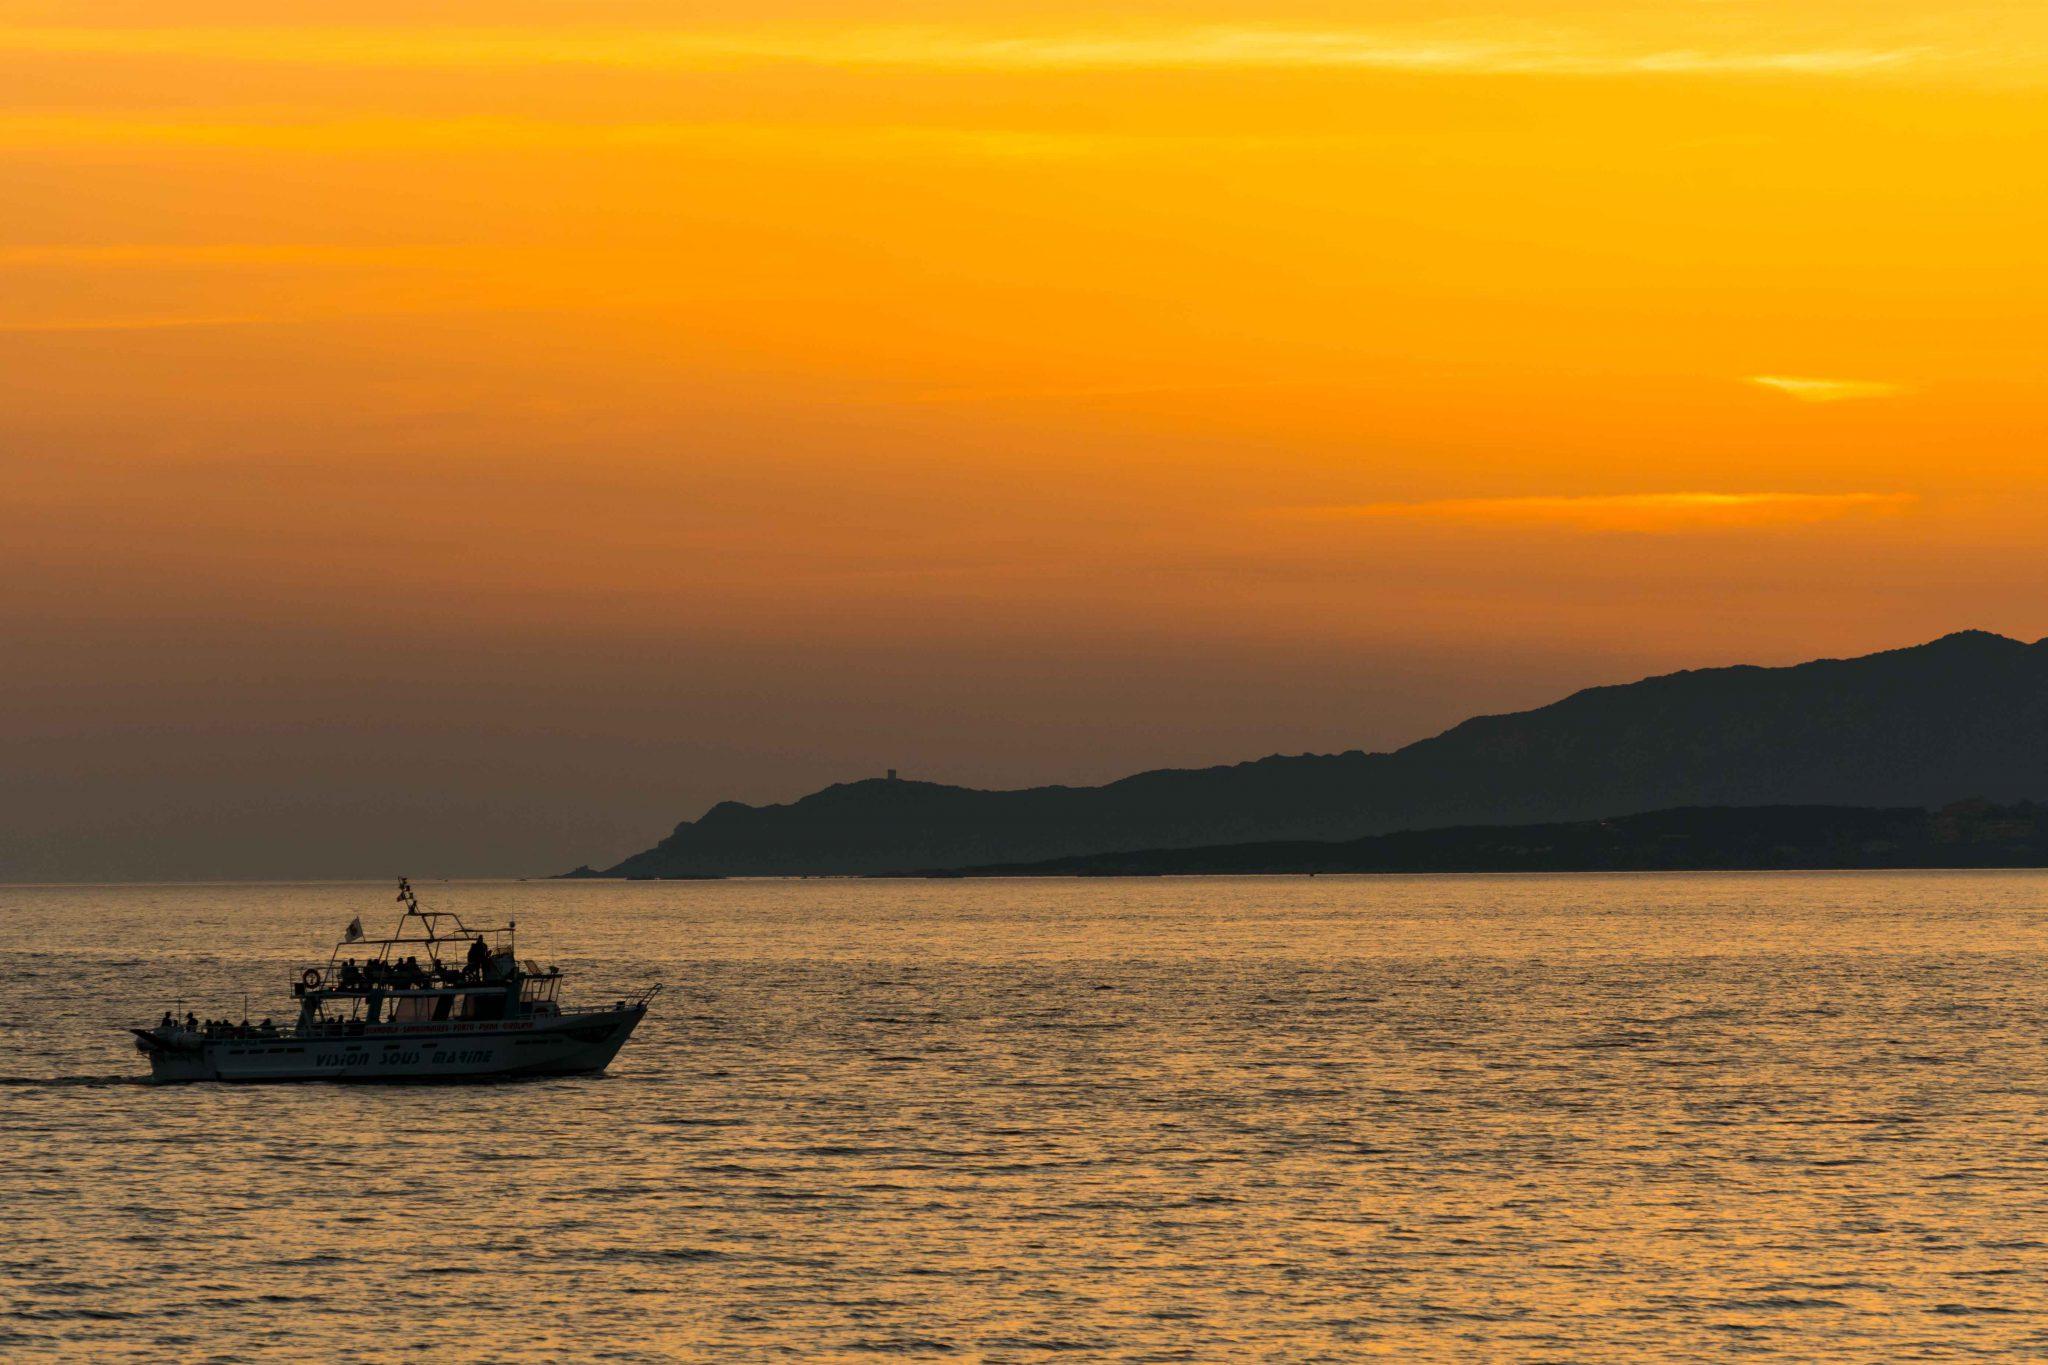 Promenade en mer à Propriano en corse du sud